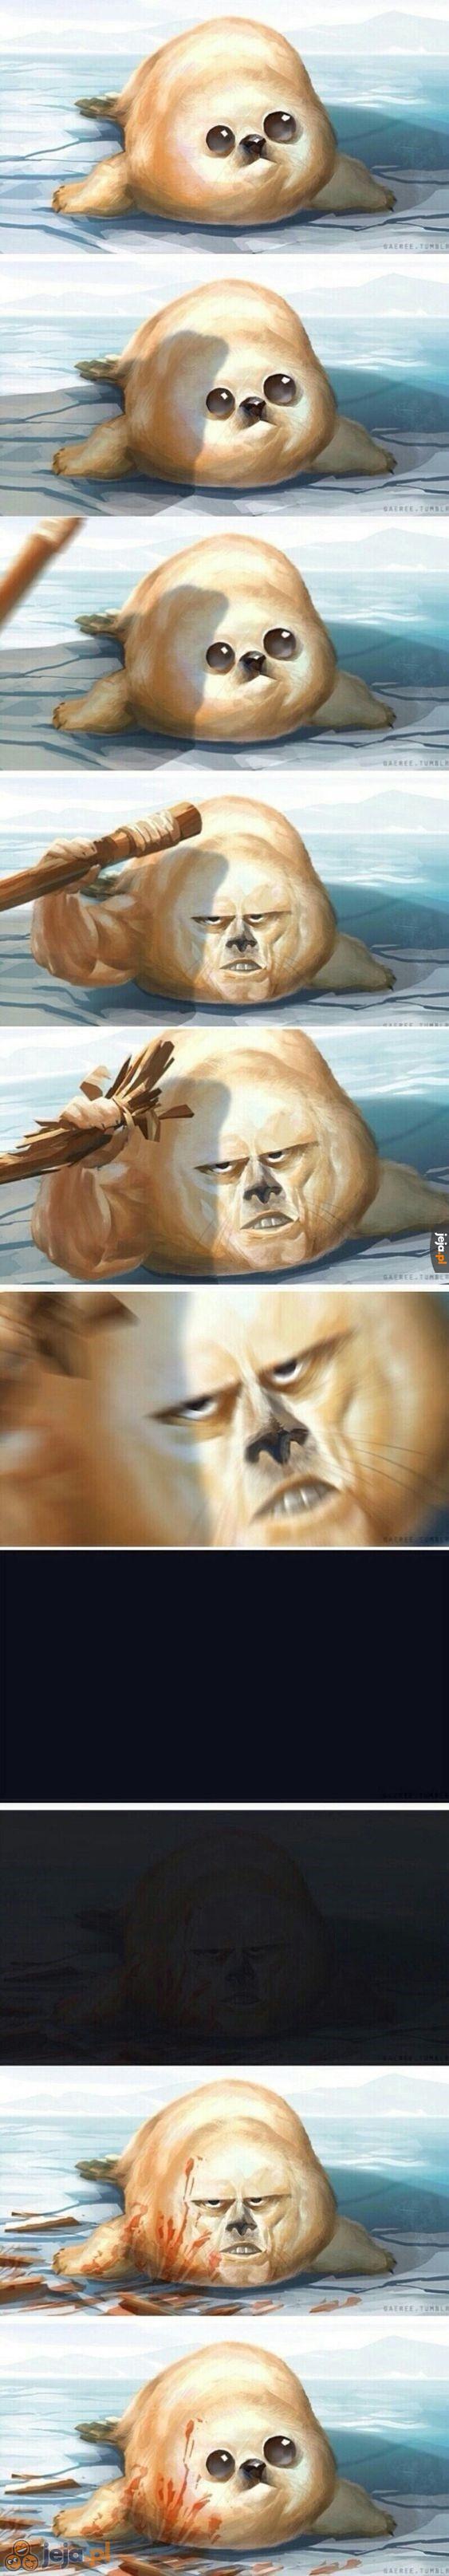 Słodka foka